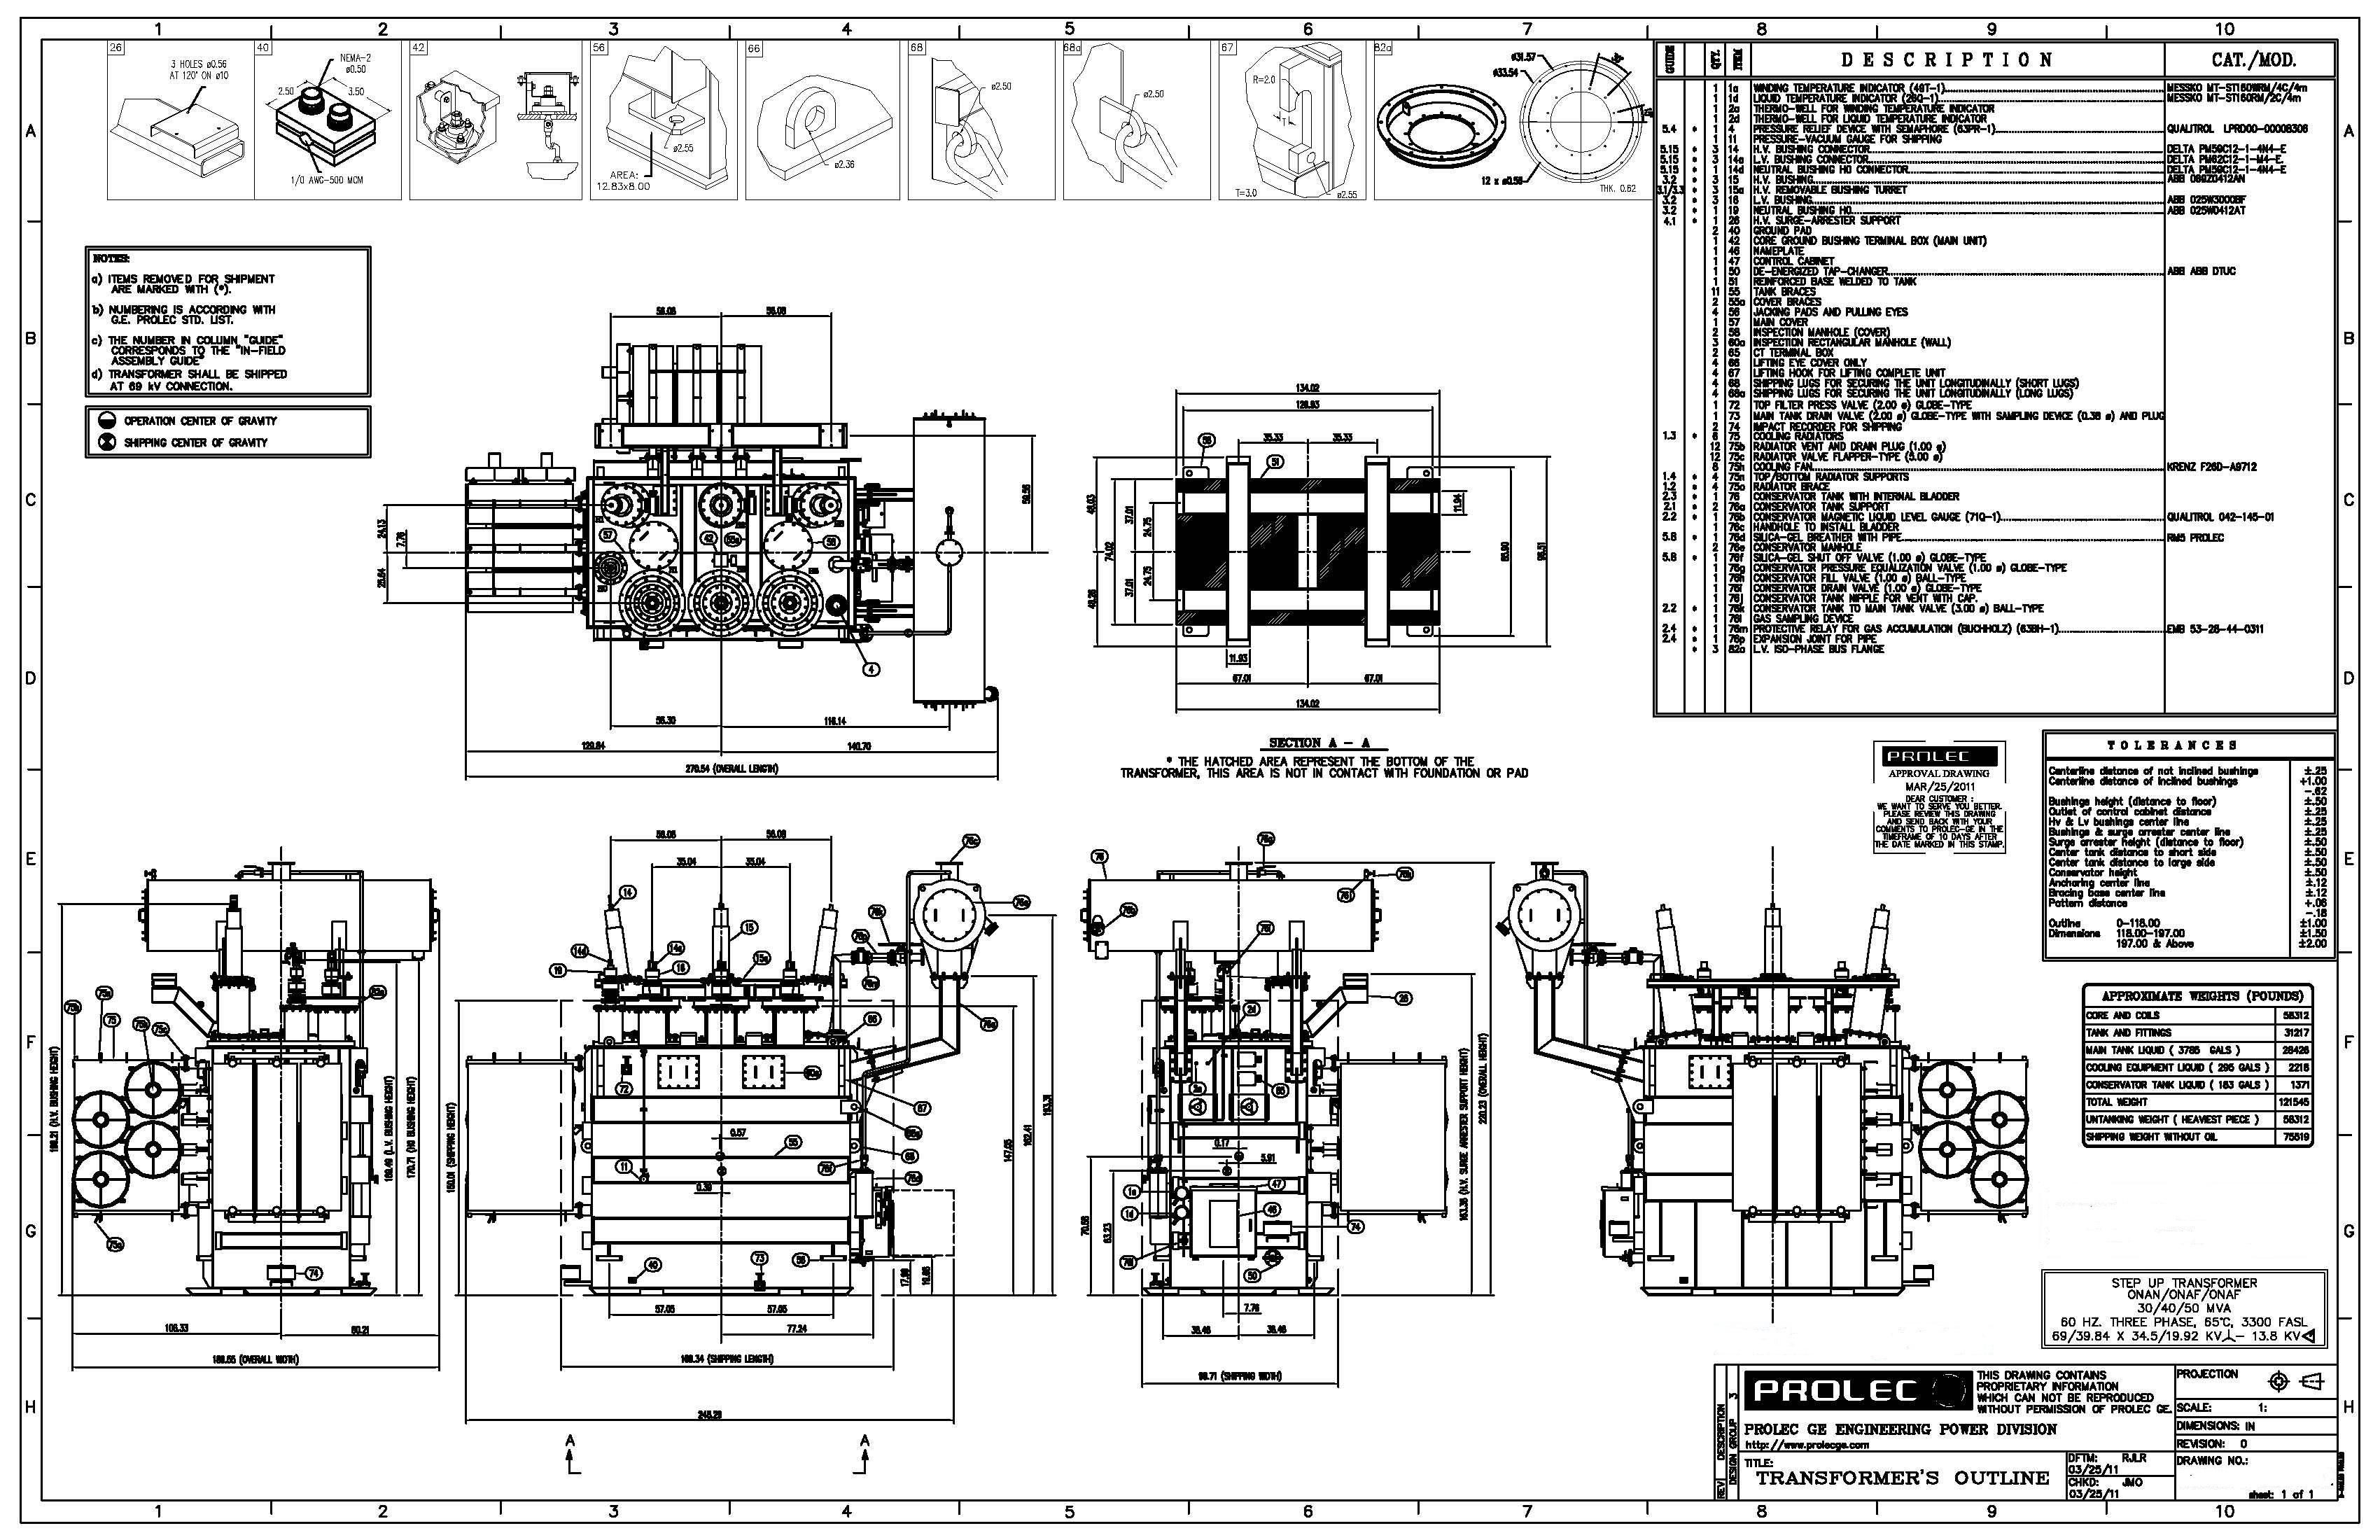 Ge Prolec Generator Step Up Transformer 30 40 50 Mva 69 X 34 5 Kv Wye